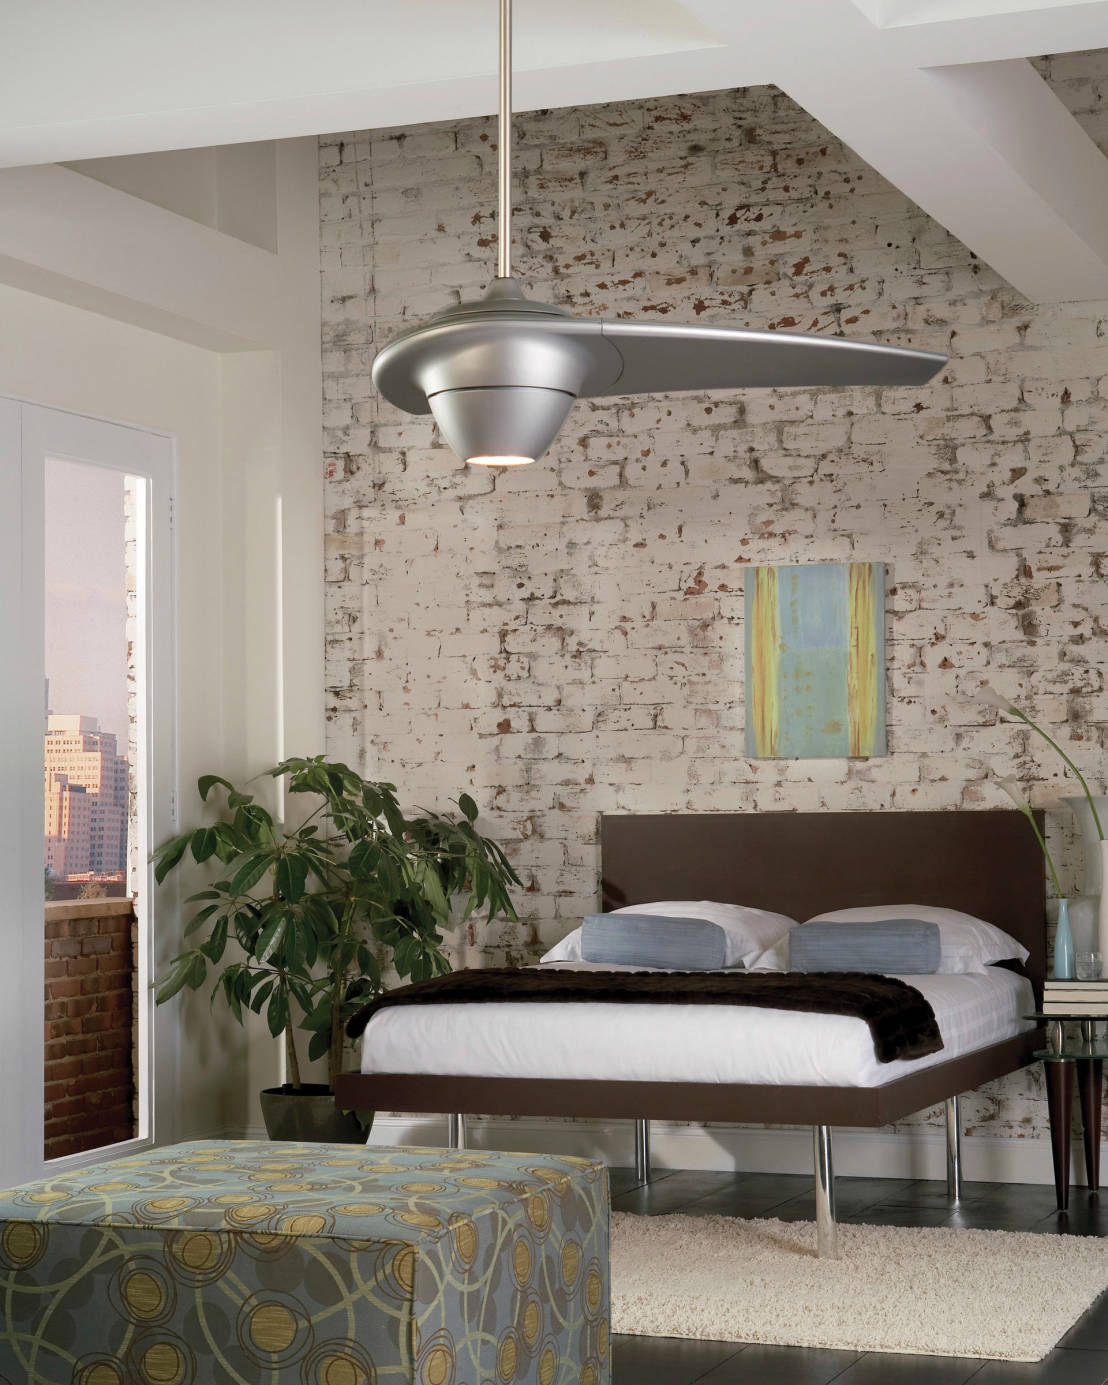 Ventiladores de techo 8 dise os fant sticos - Ventiladores de techo rusticos ...